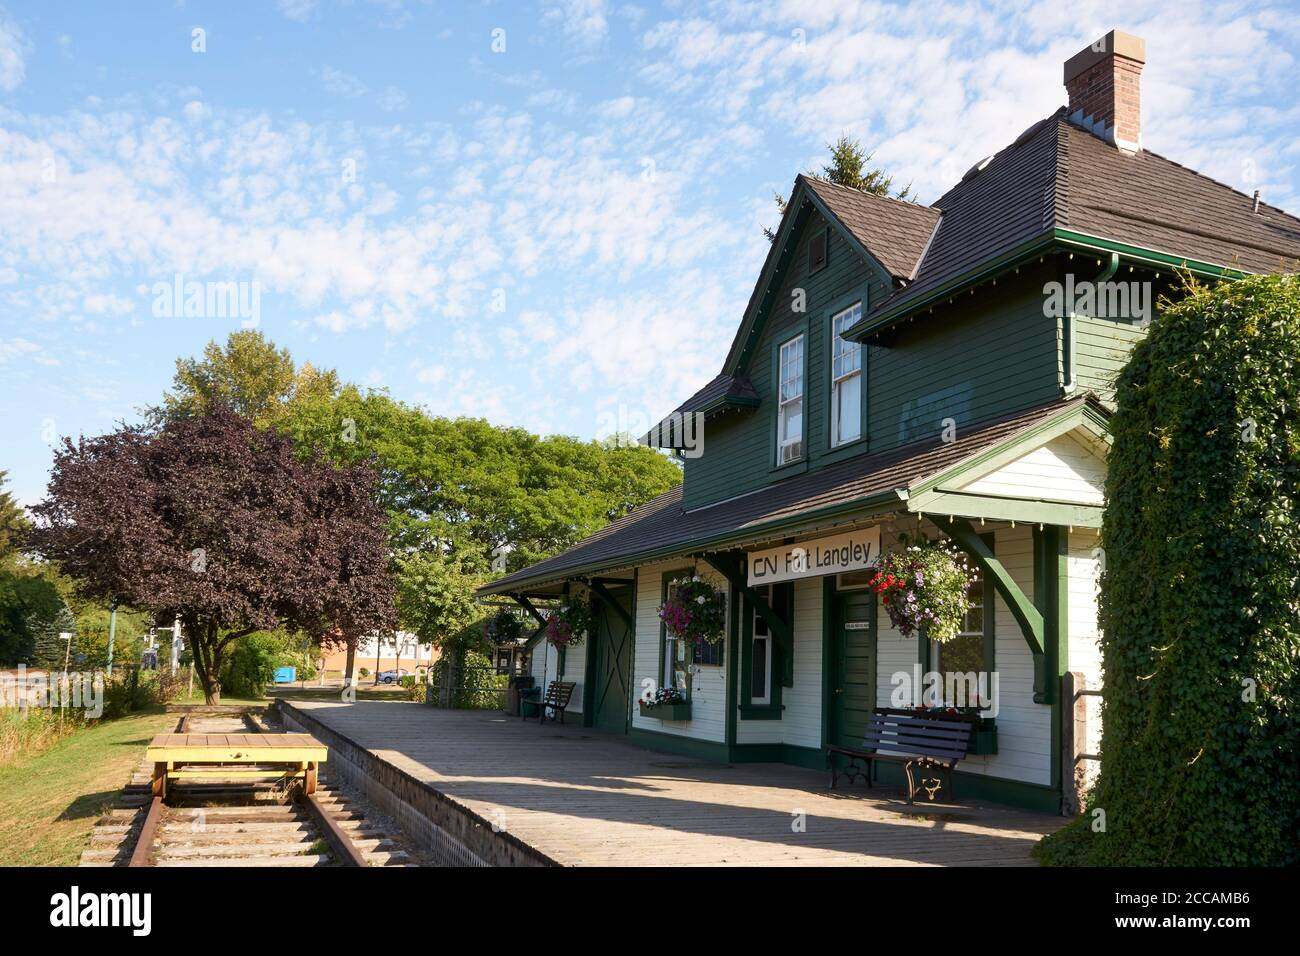 Heritage CNR Canadian National Railway Station nella città di Fort Langley, British Columbia, Canada Foto Stock